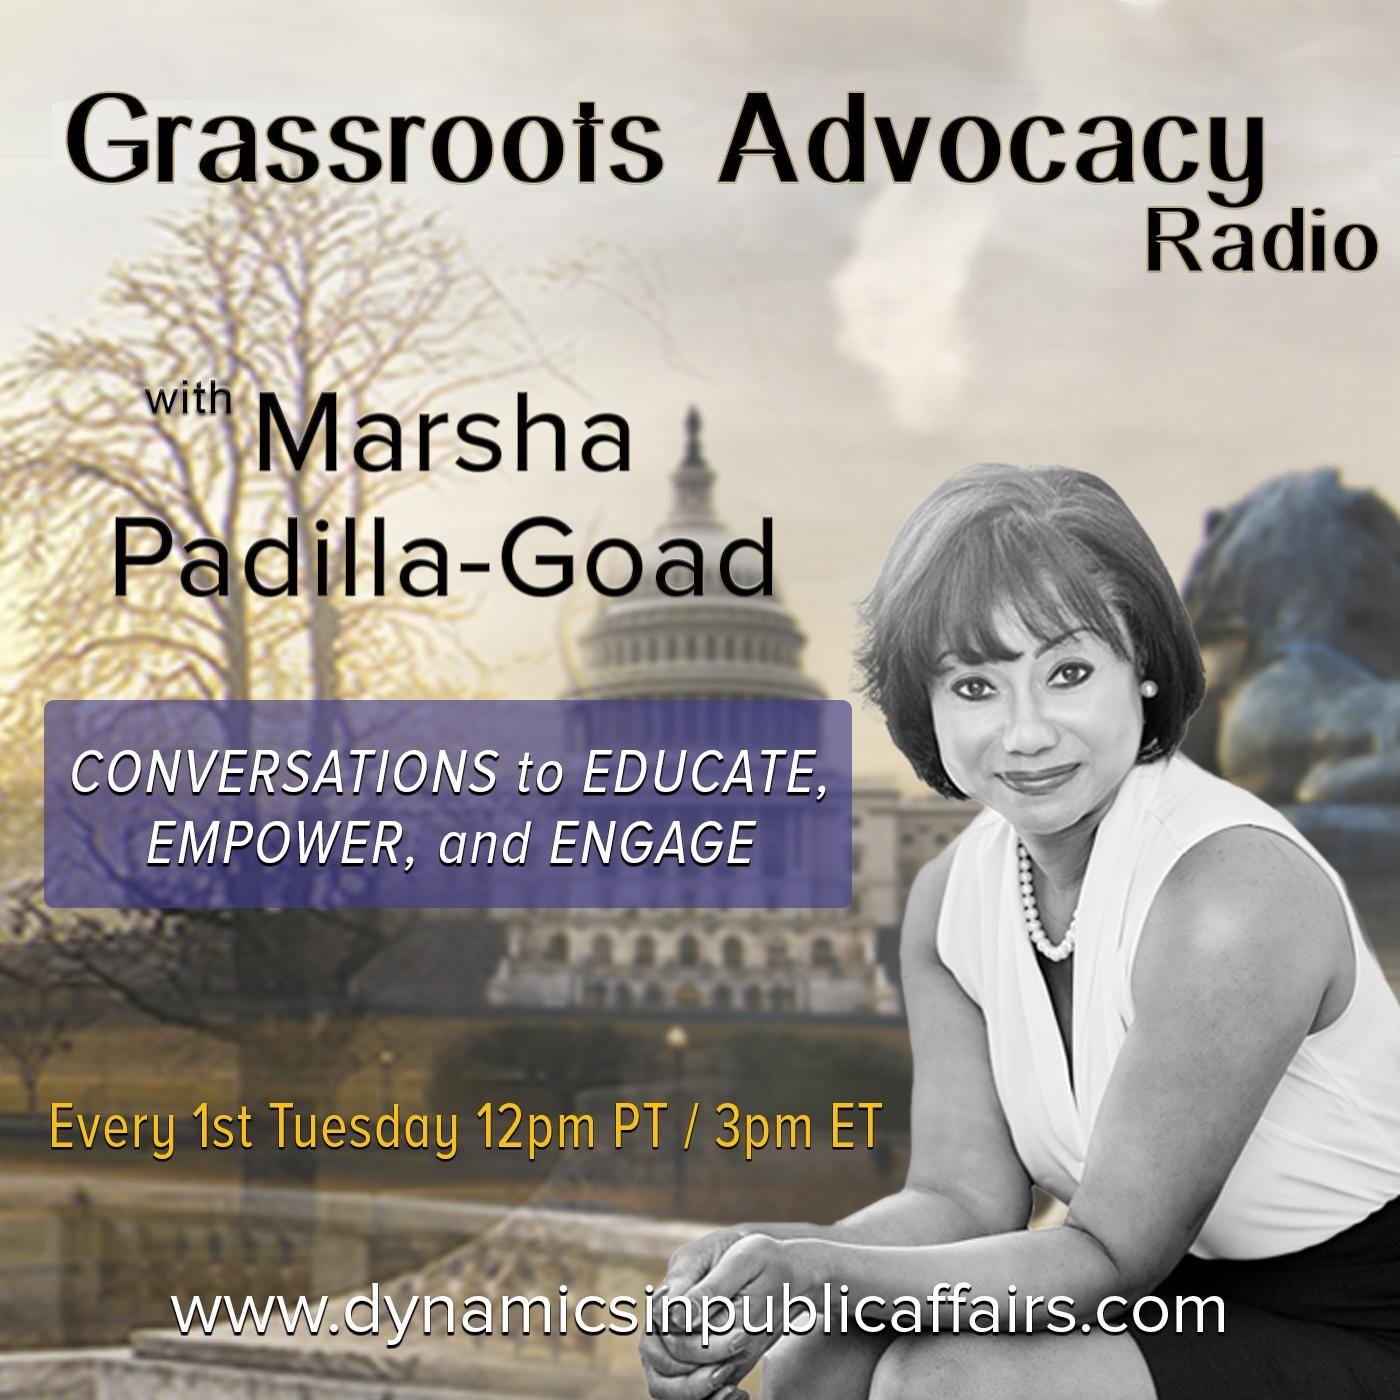 Grassroots Advocacy Radio